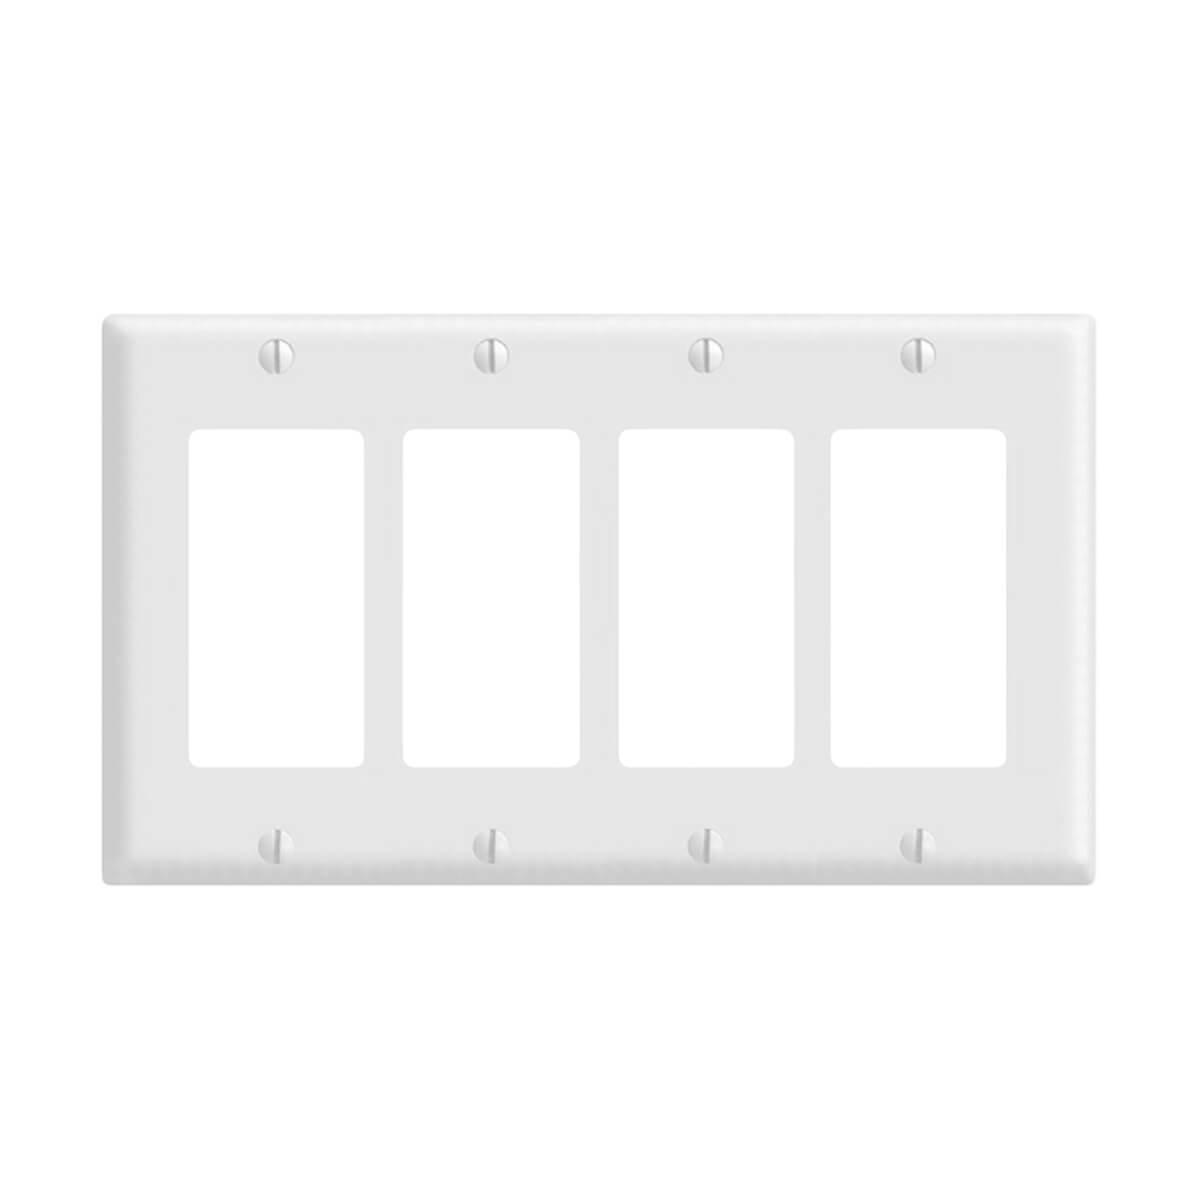 Decora wall plate 4 Gang - White